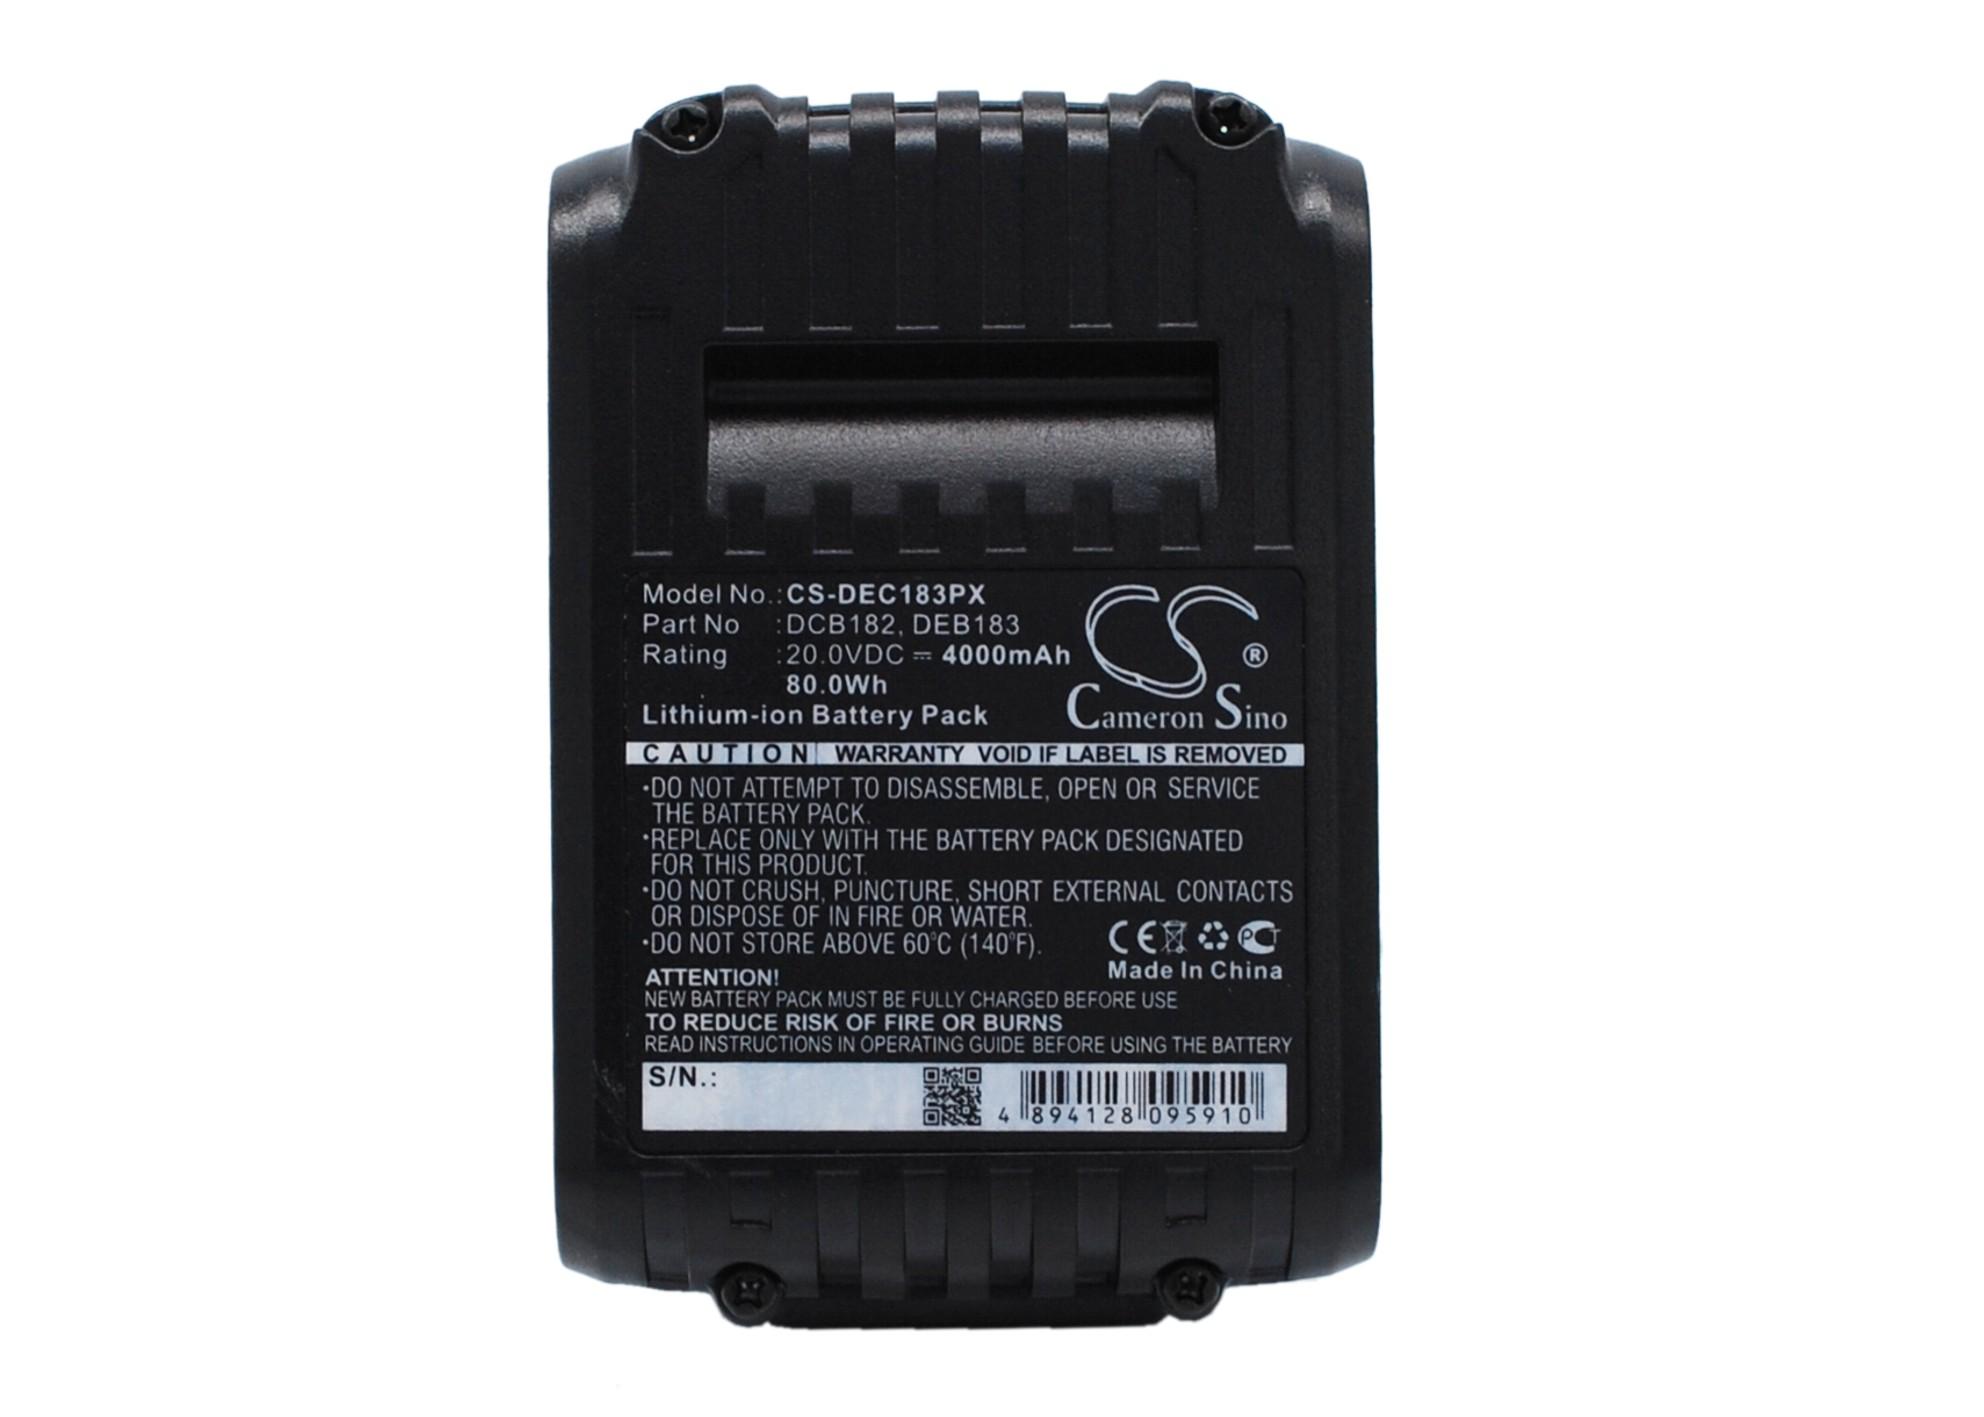 Cameron Sino baterie do nářadí pro DEWALT DCS380B 20V Li-ion 4000mAh černá - neoriginální